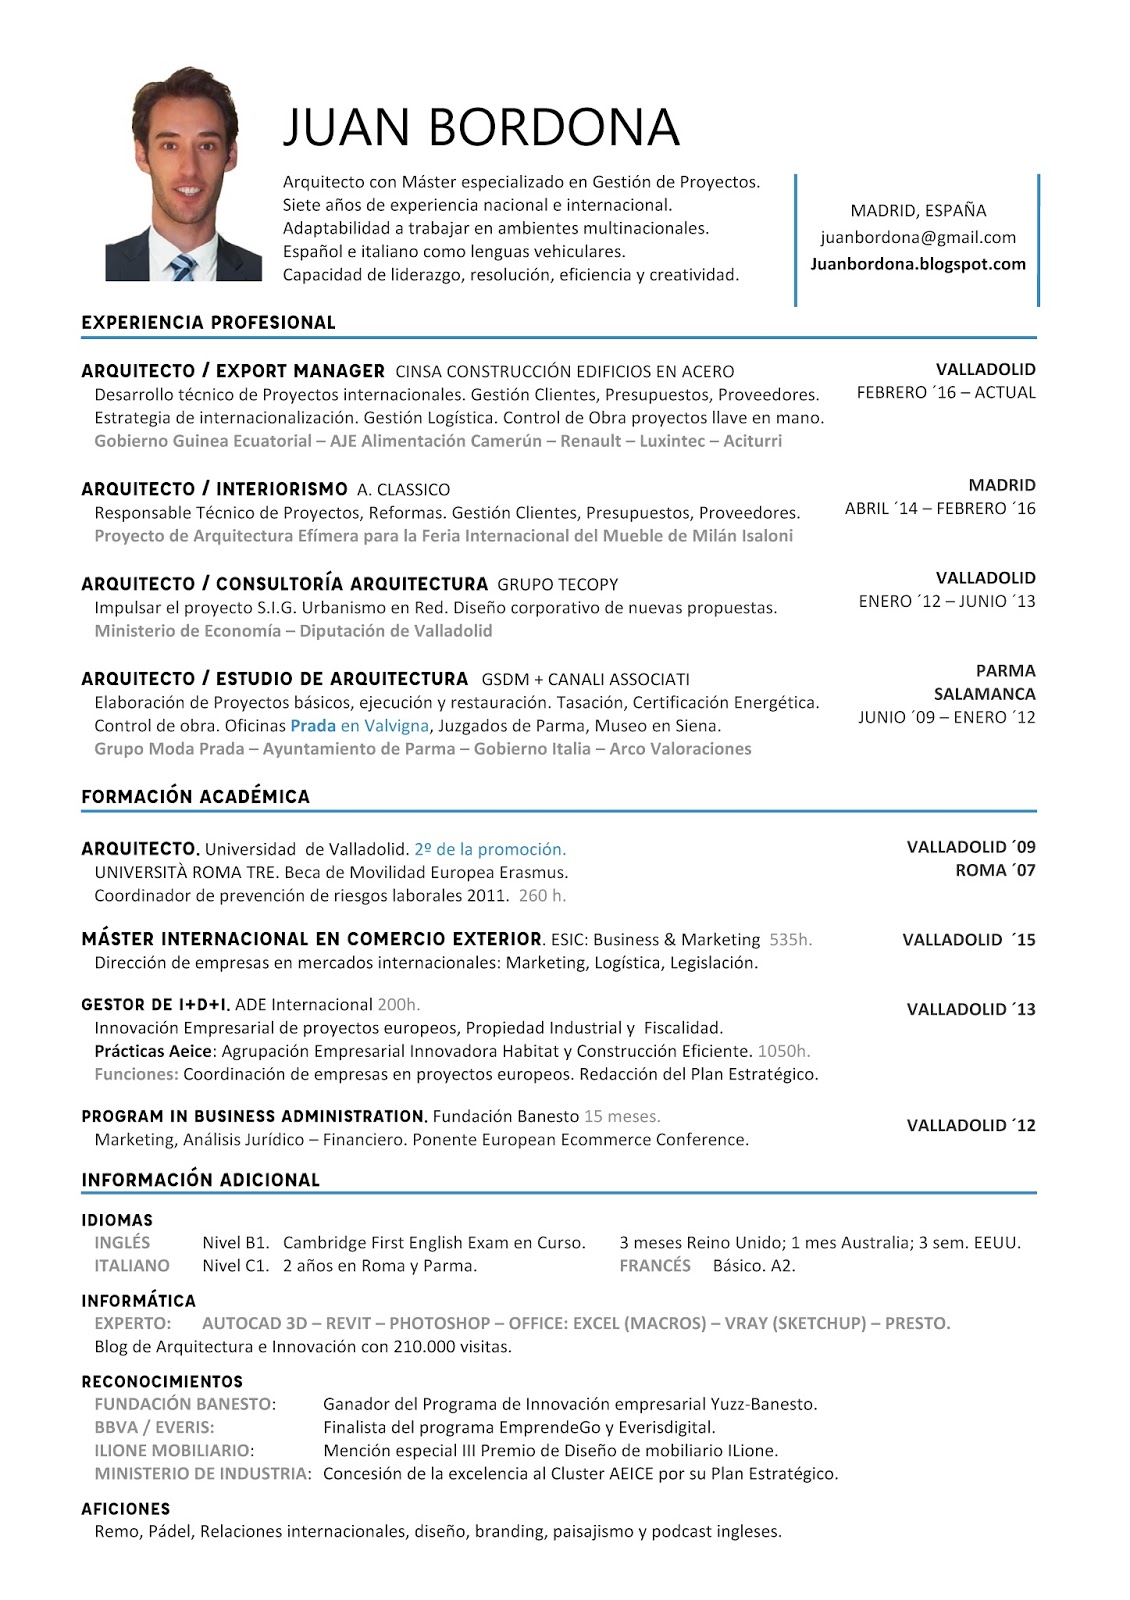 Curriculum Vitae Arquitecto Juan Bordona | Blog de Juan Sánchez-Bordona